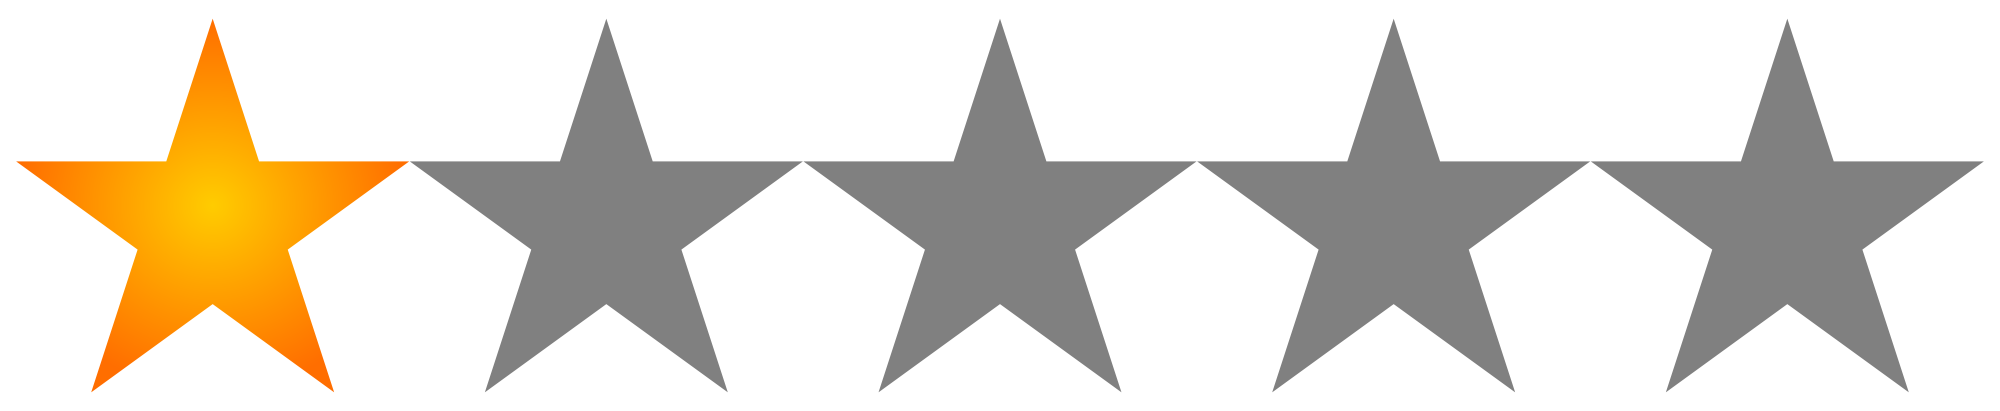 google review stars, Richmond VA